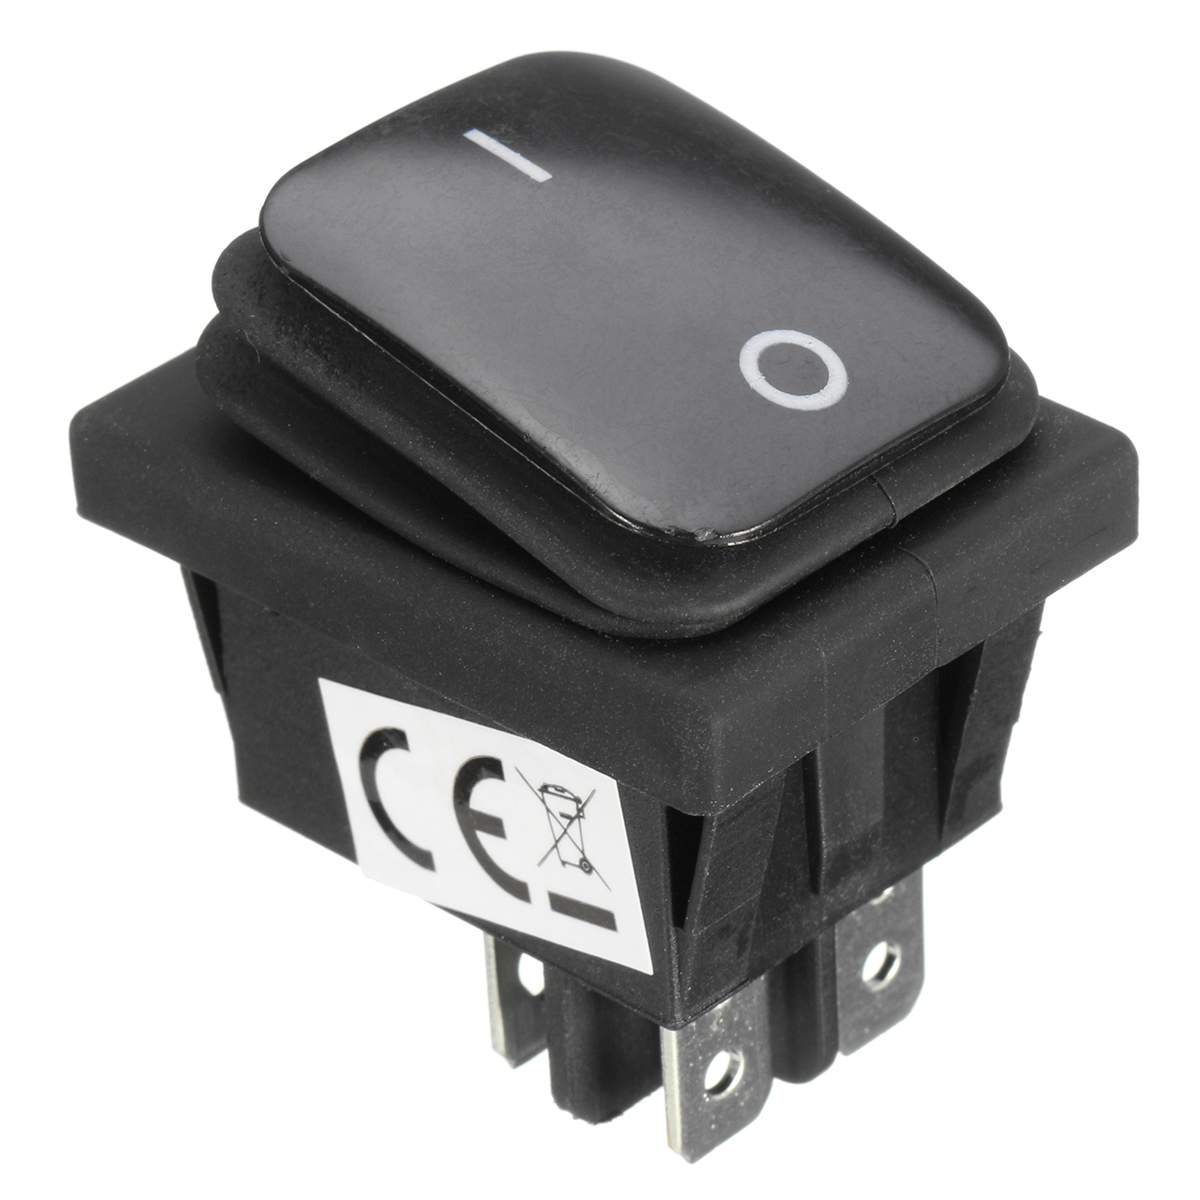 M5x12mm Stainless Steel Hex Socket Button Head Screws 50 Pcs G4D9